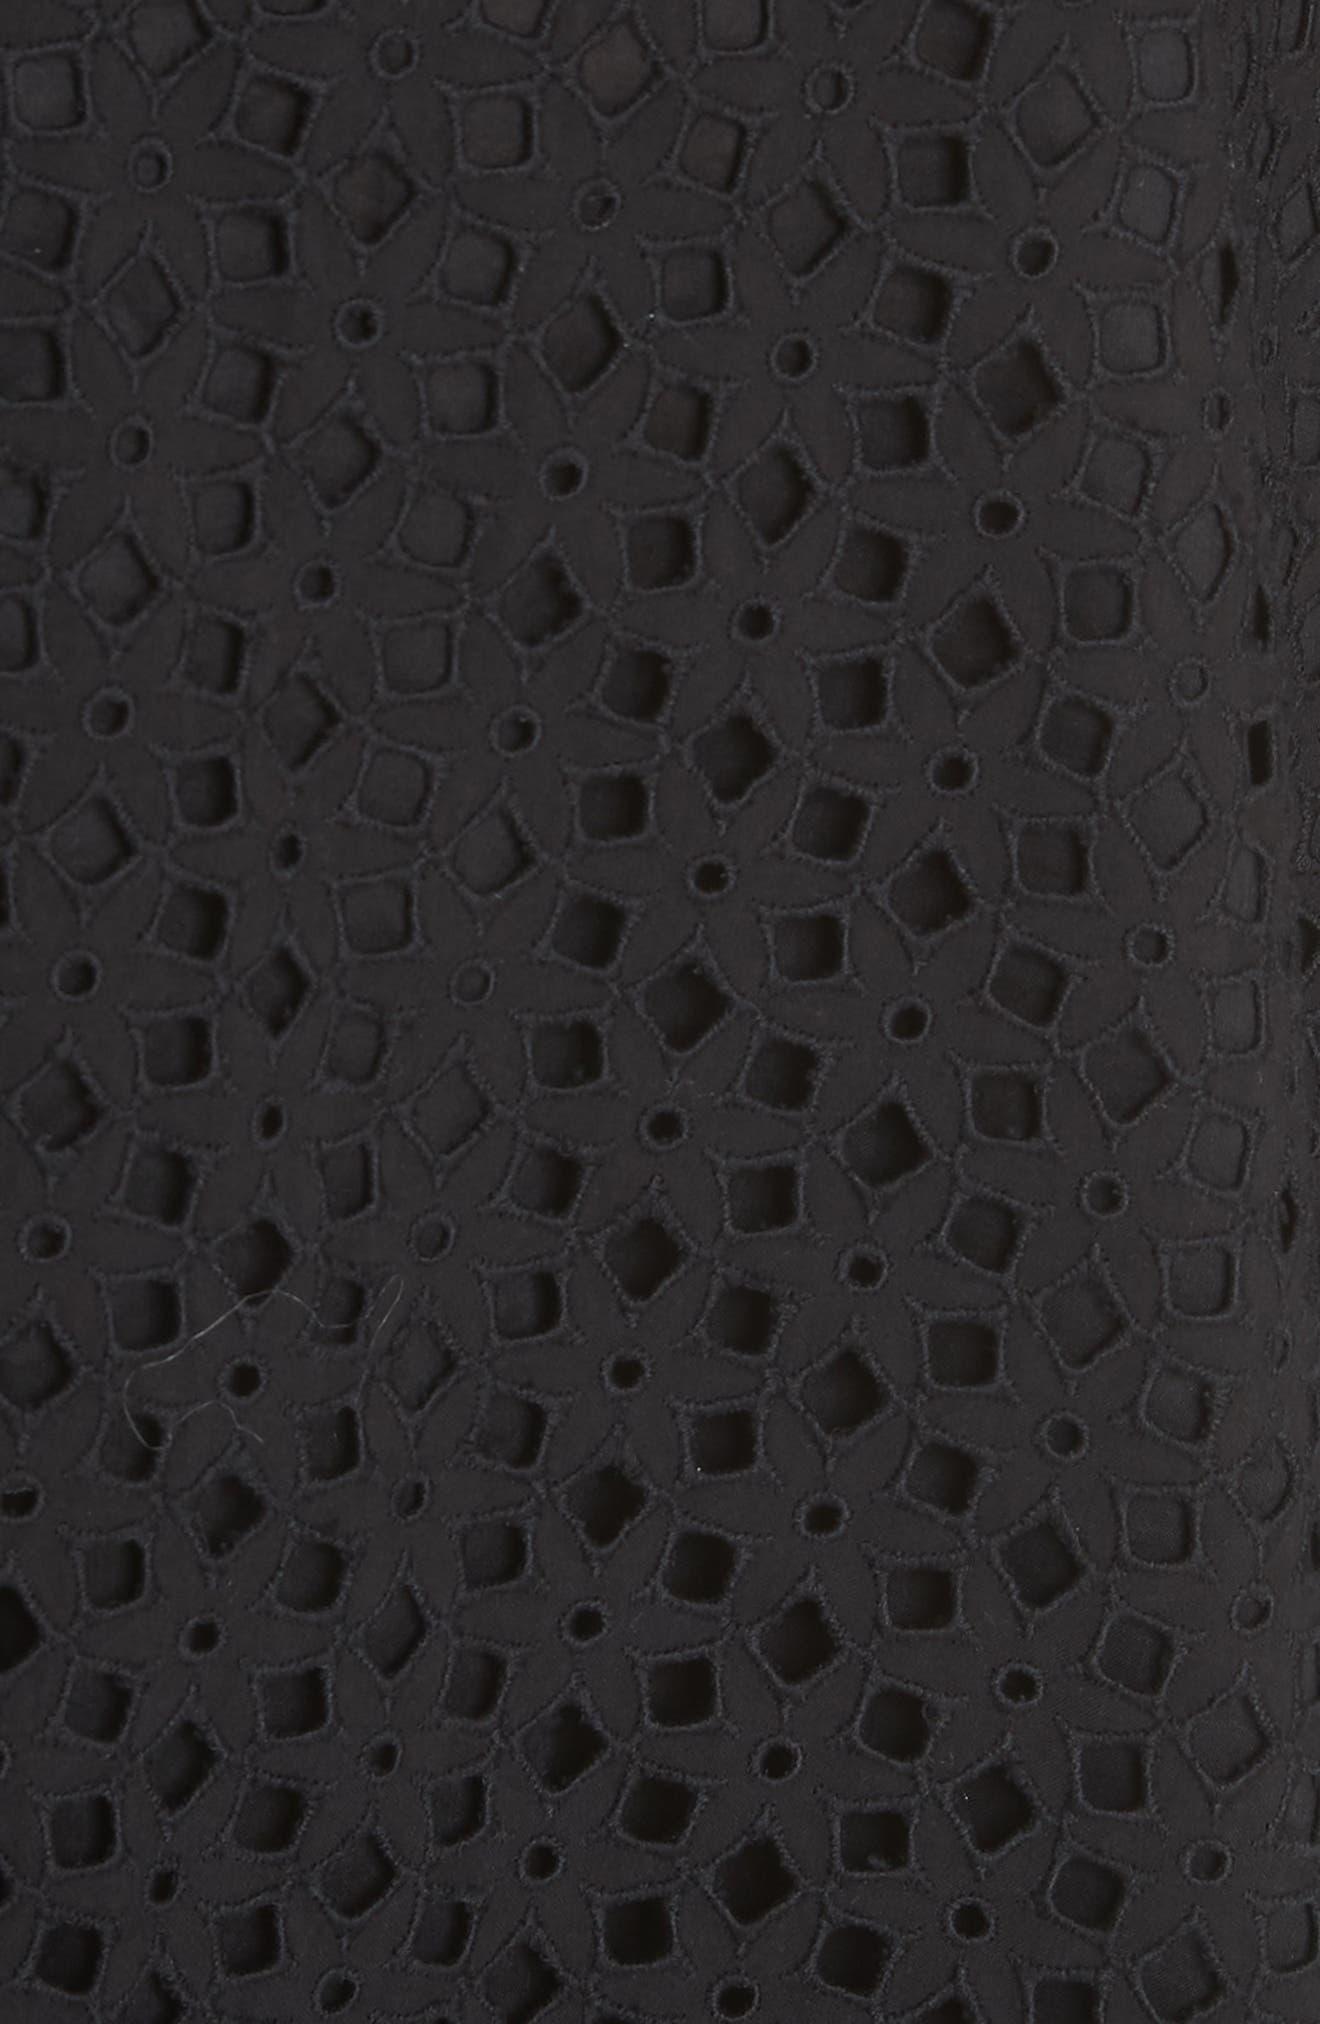 Cathy Cotton Eyelet Dress,                             Alternate thumbnail 5, color,                             Black